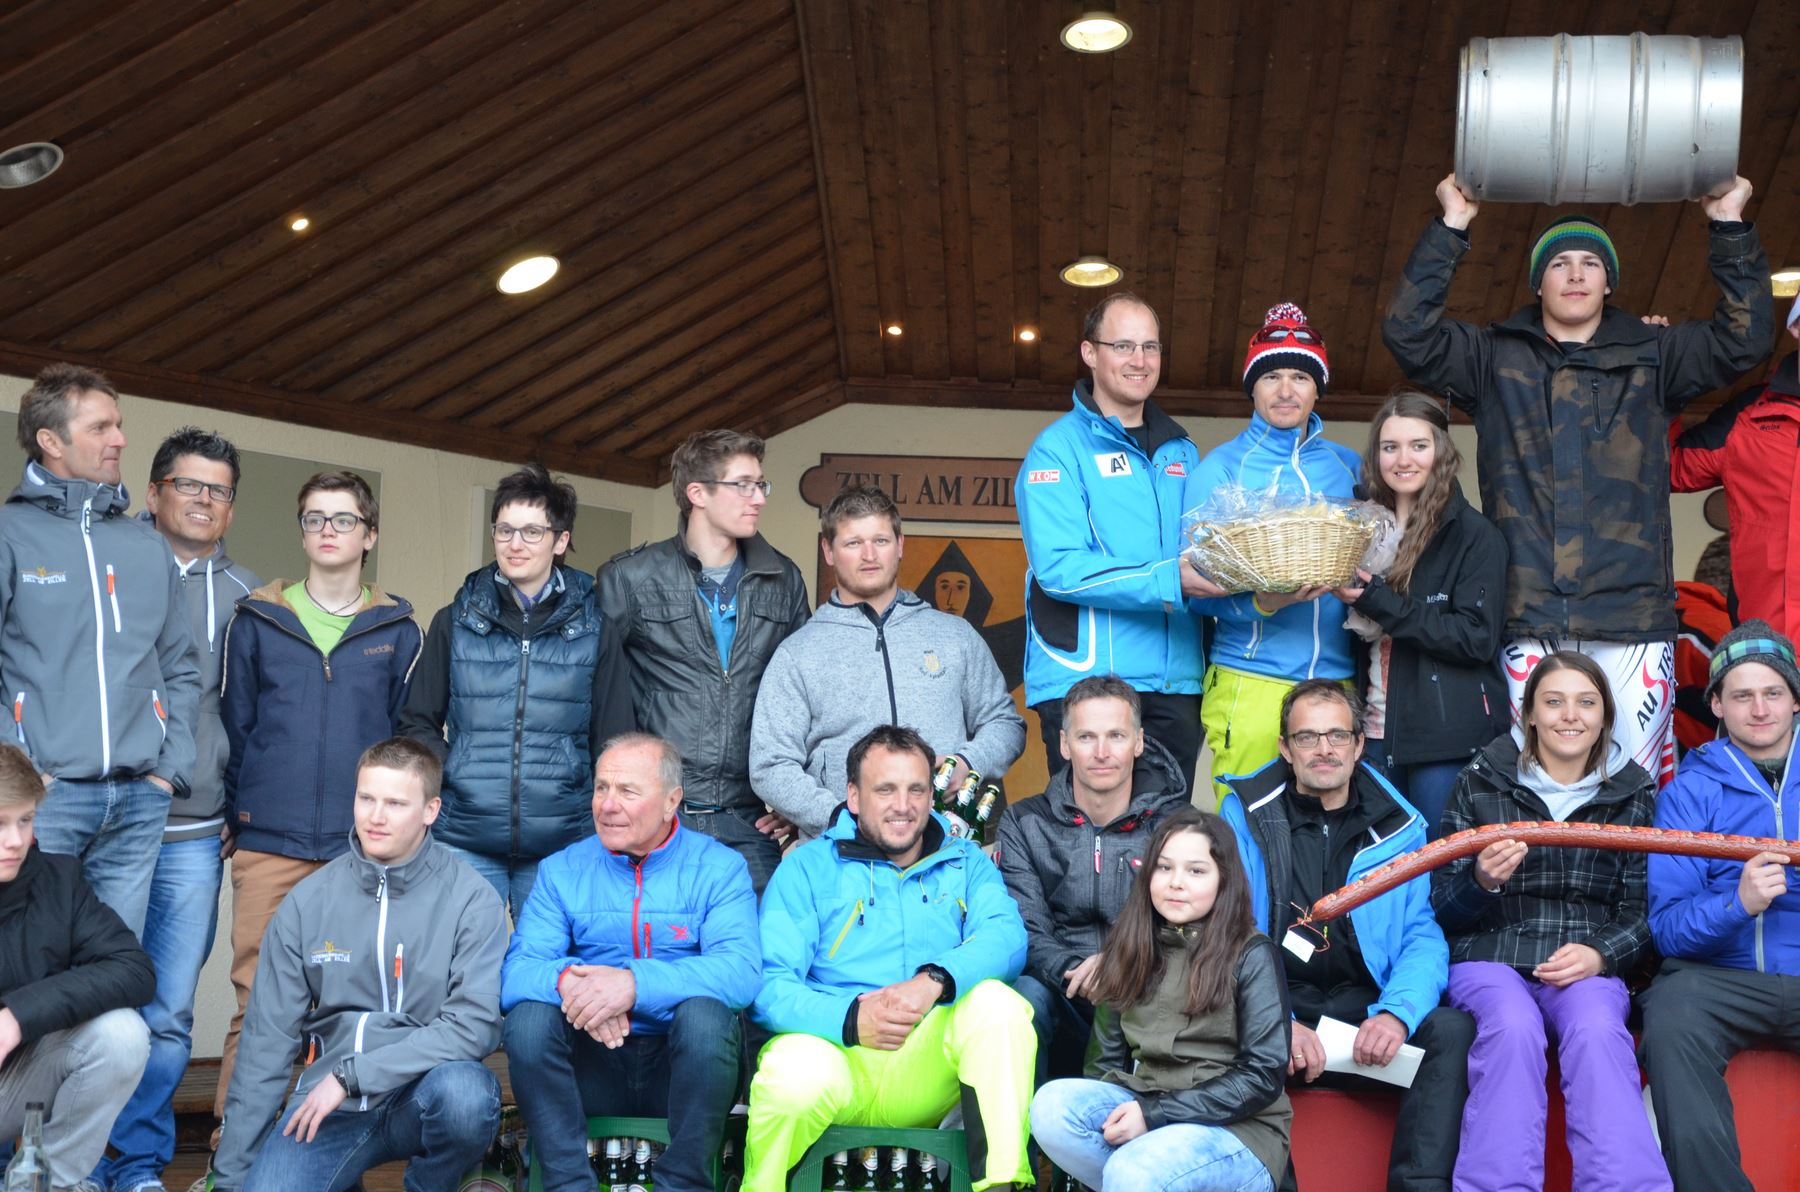 2015-03-22 BV Zillertal Skirennen 583.JPG